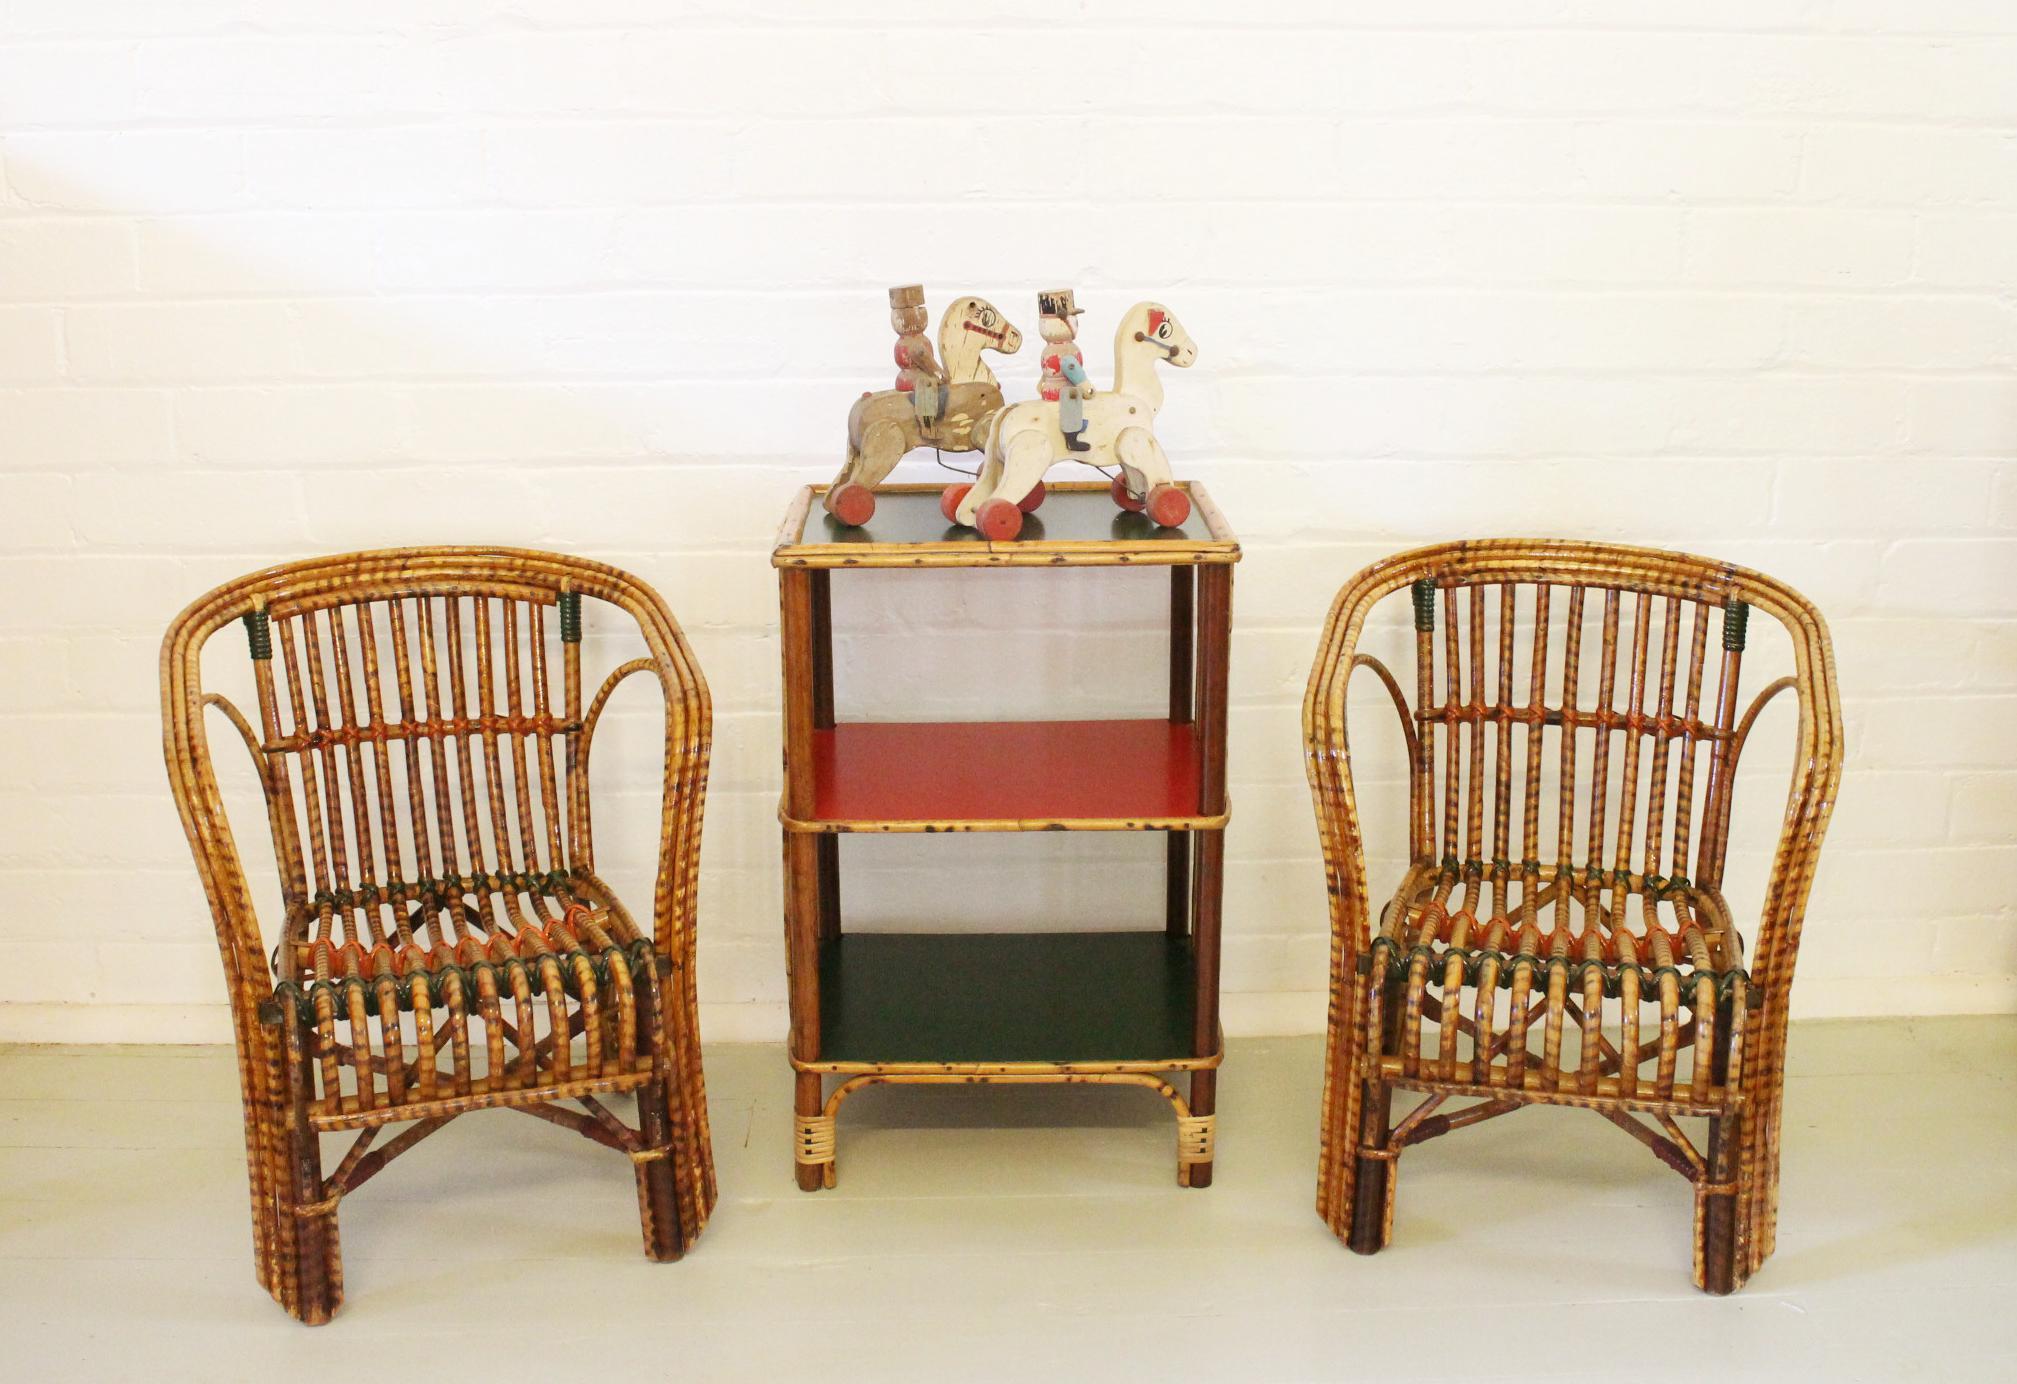 Vintage Cane Chairs.jpg